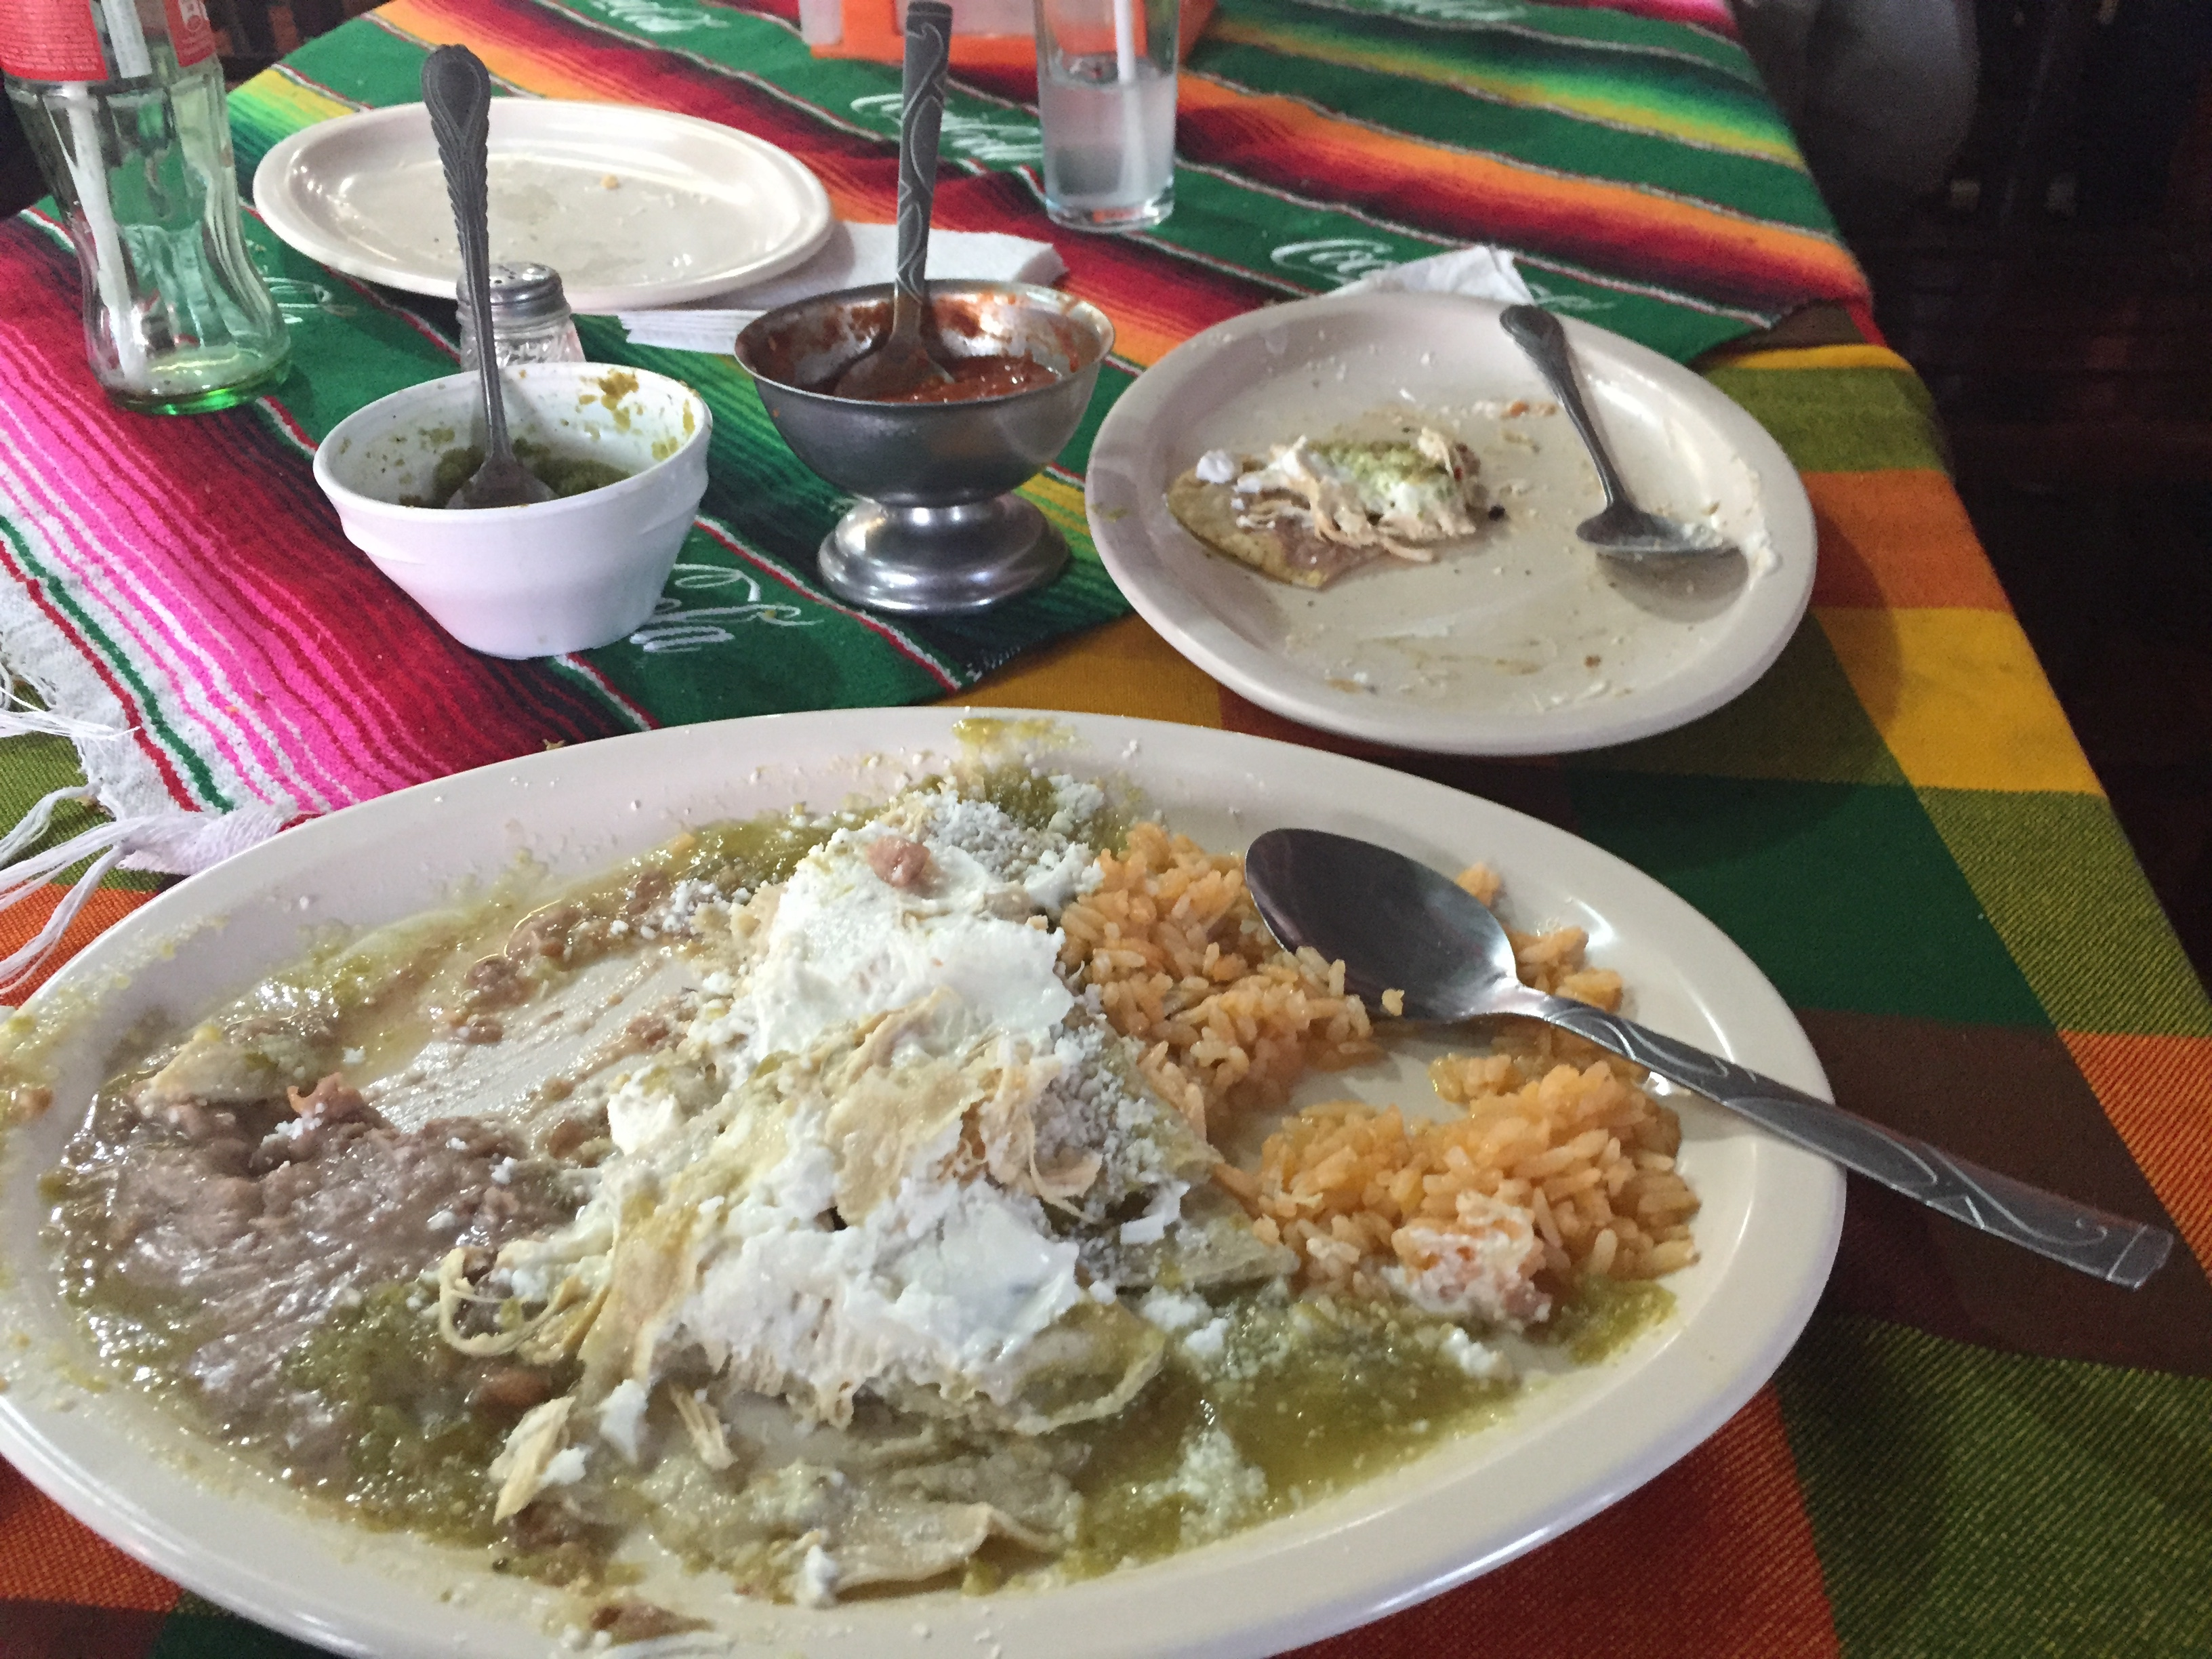 A half eaten plate of Mexican style enchiladas.